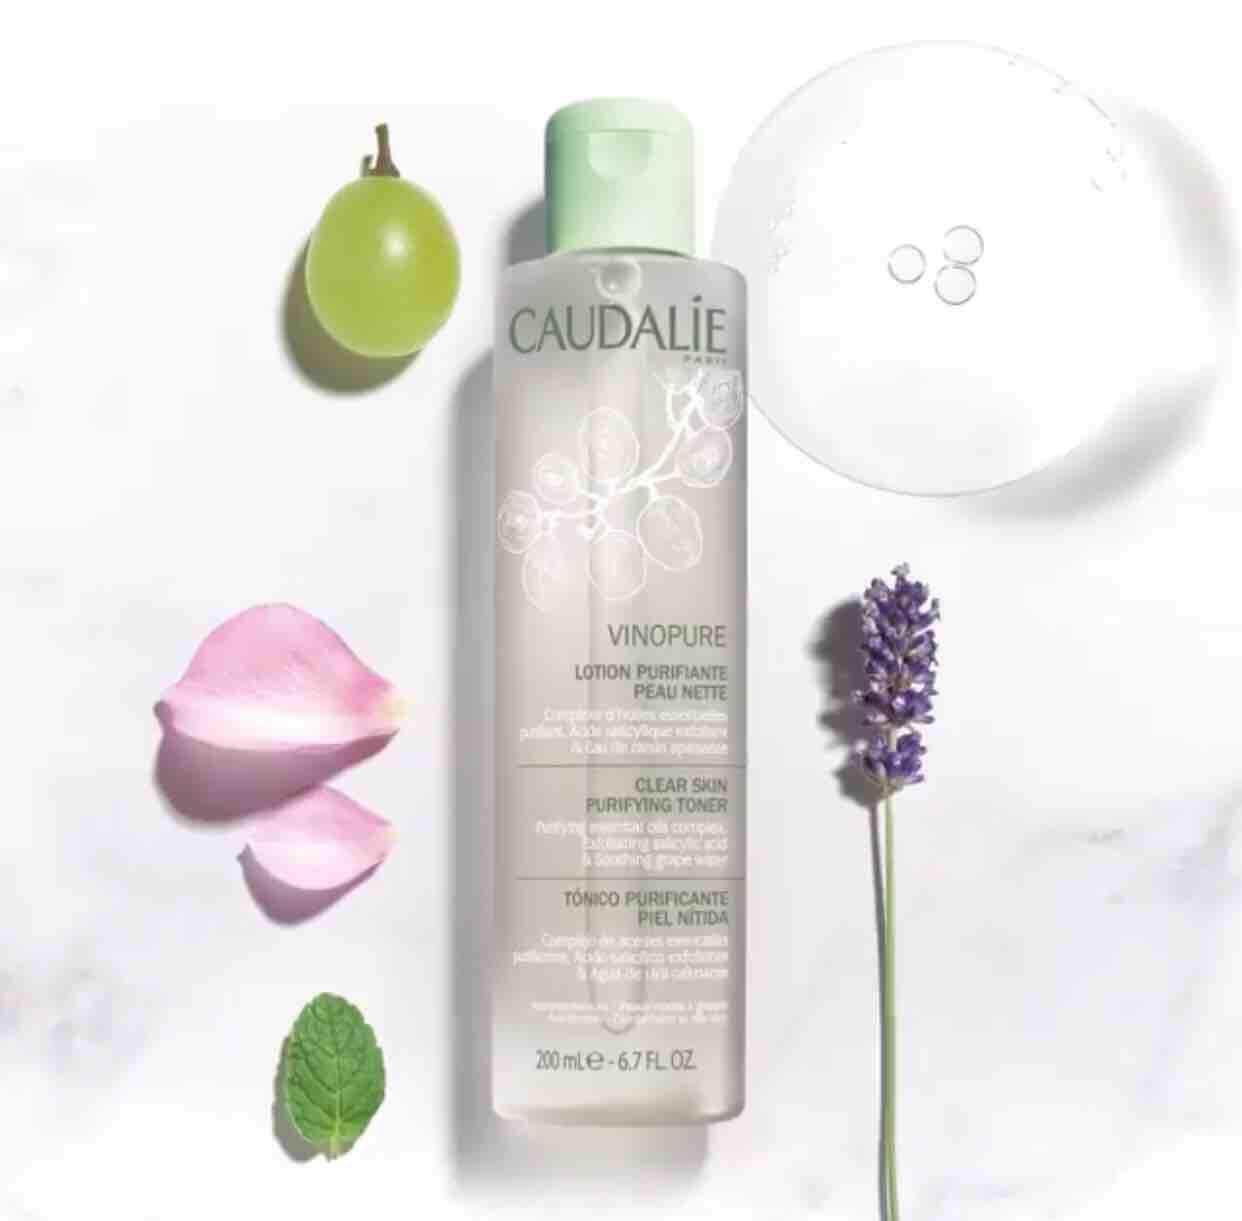 Caudalie Vinopure Clear Skin Purifying Toner 200 Ml..